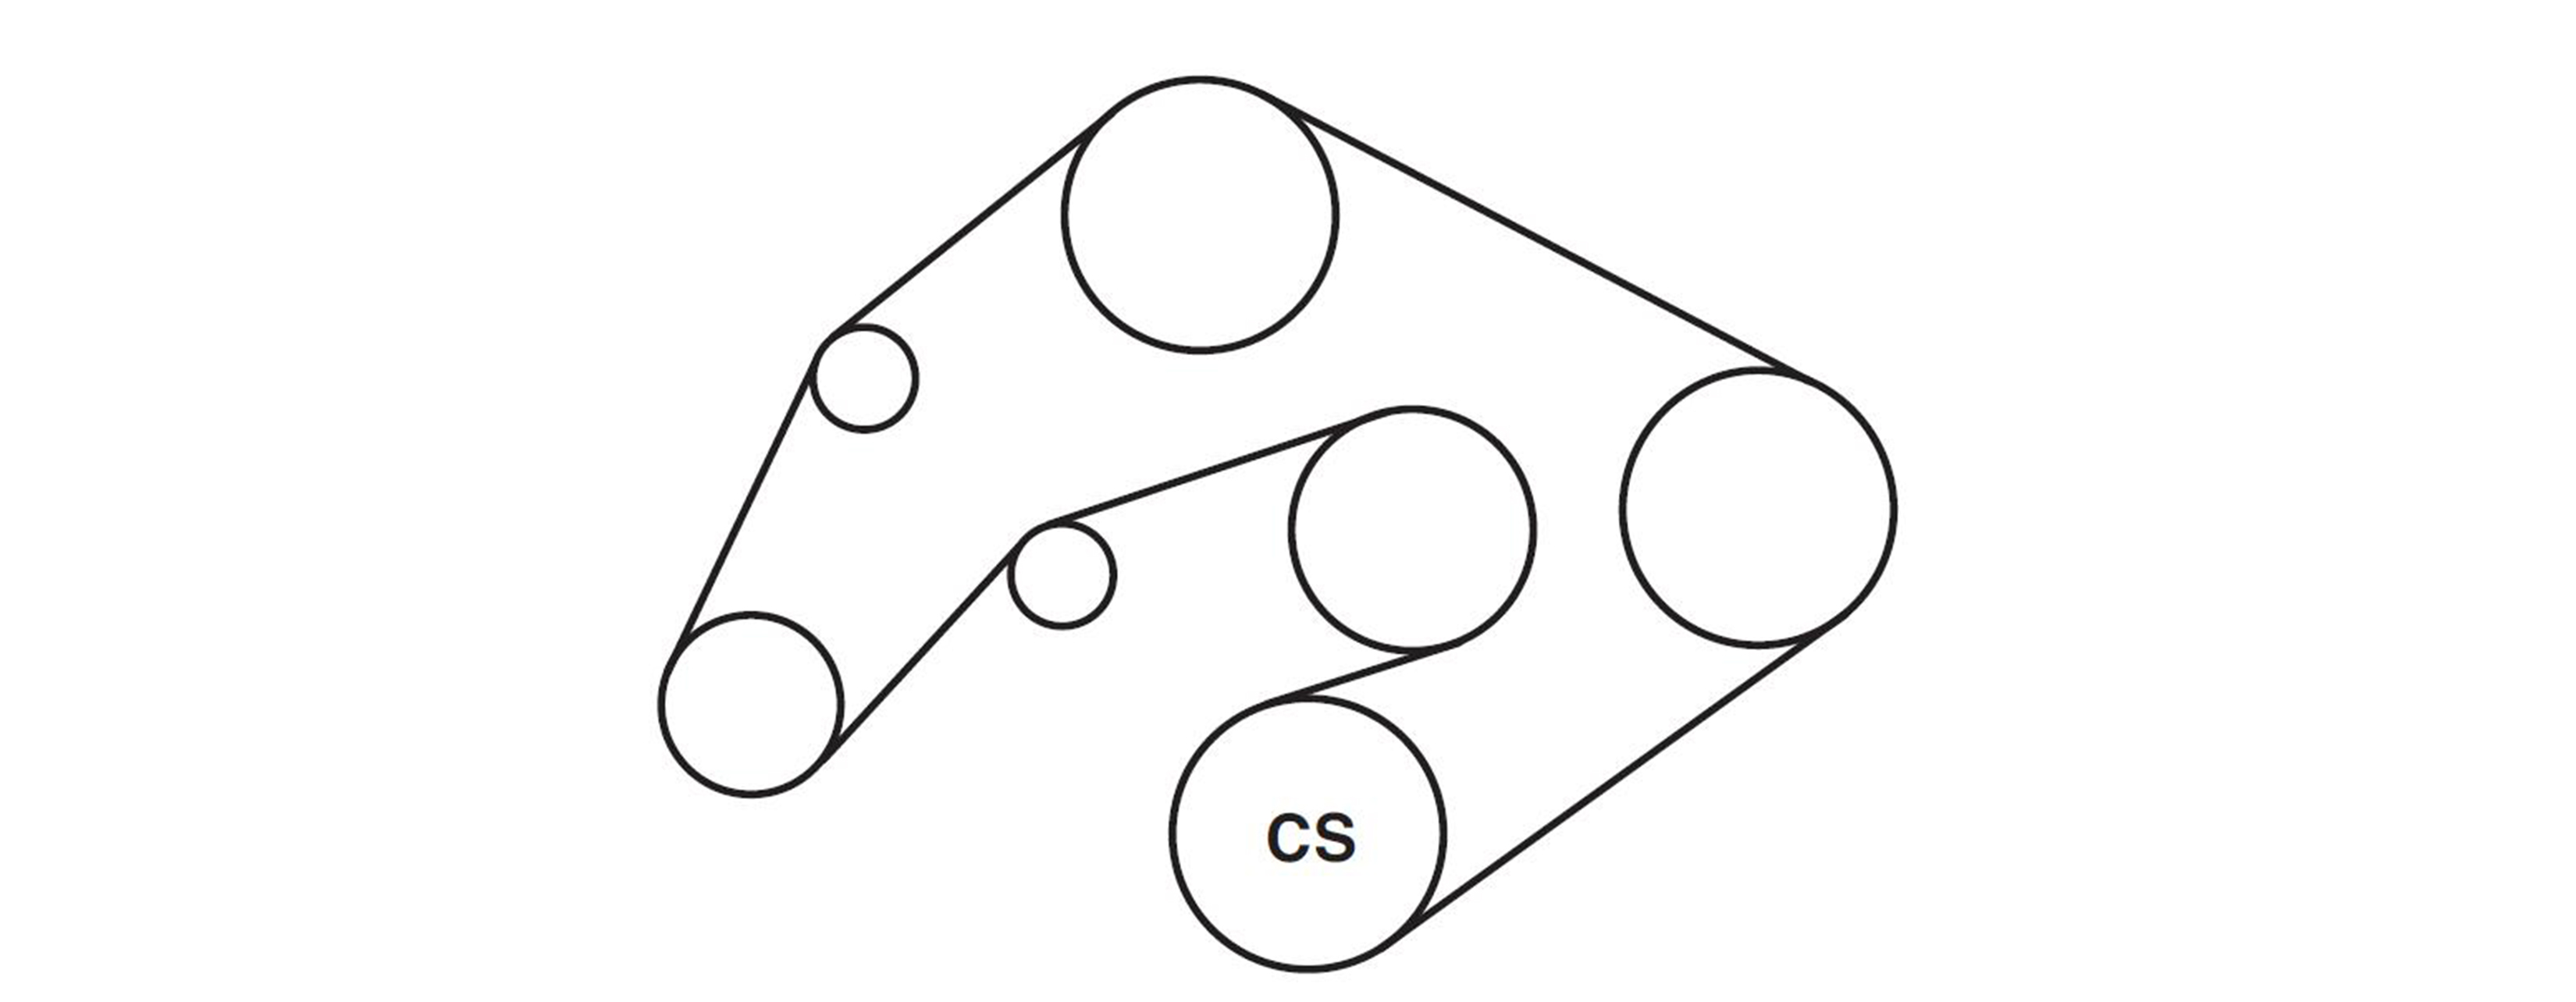 Chrysler Pacifica Serpentine Belt Diagram